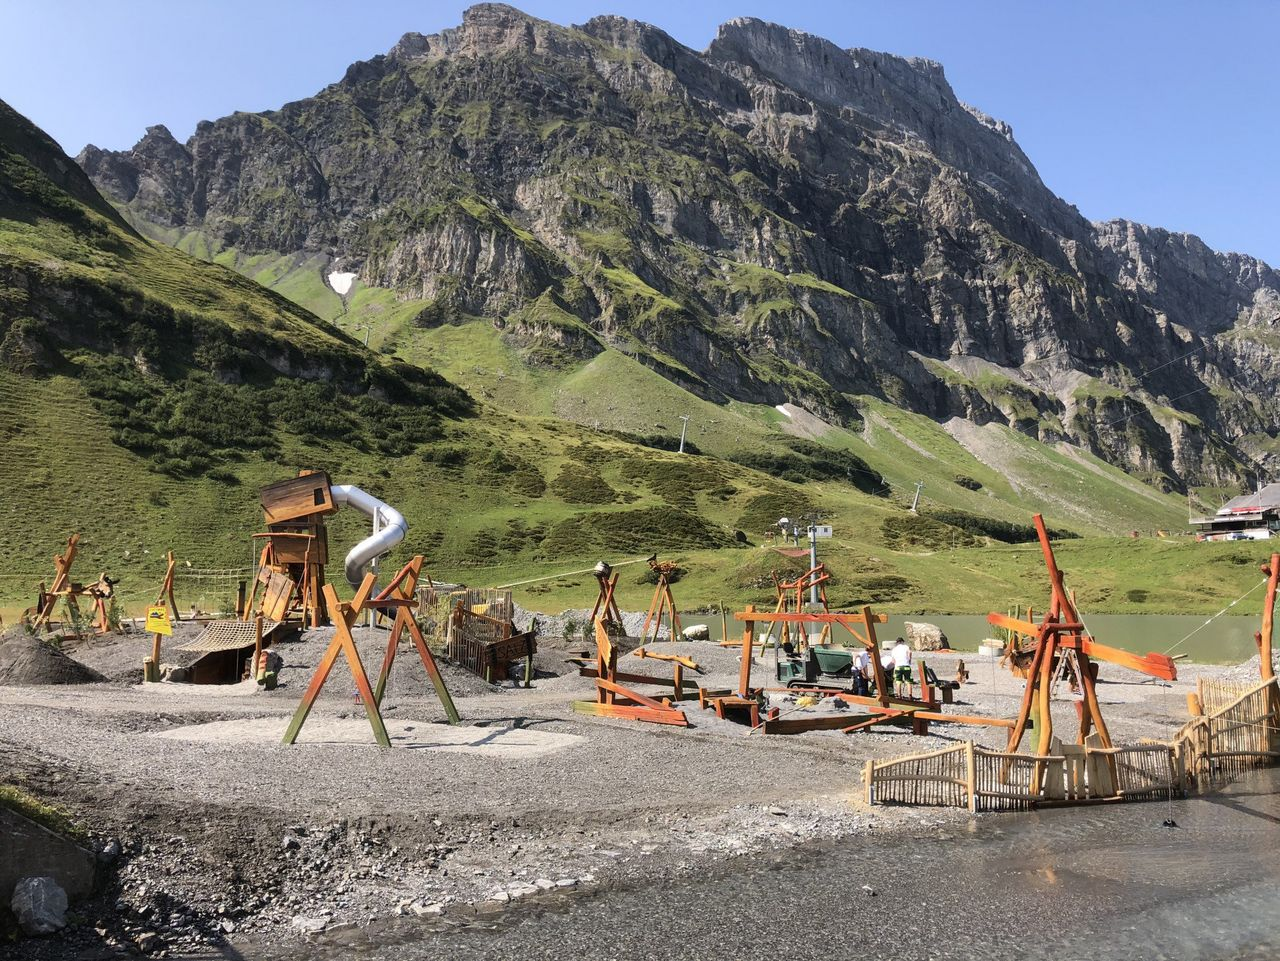 Playground Schmuggler at Trübsee